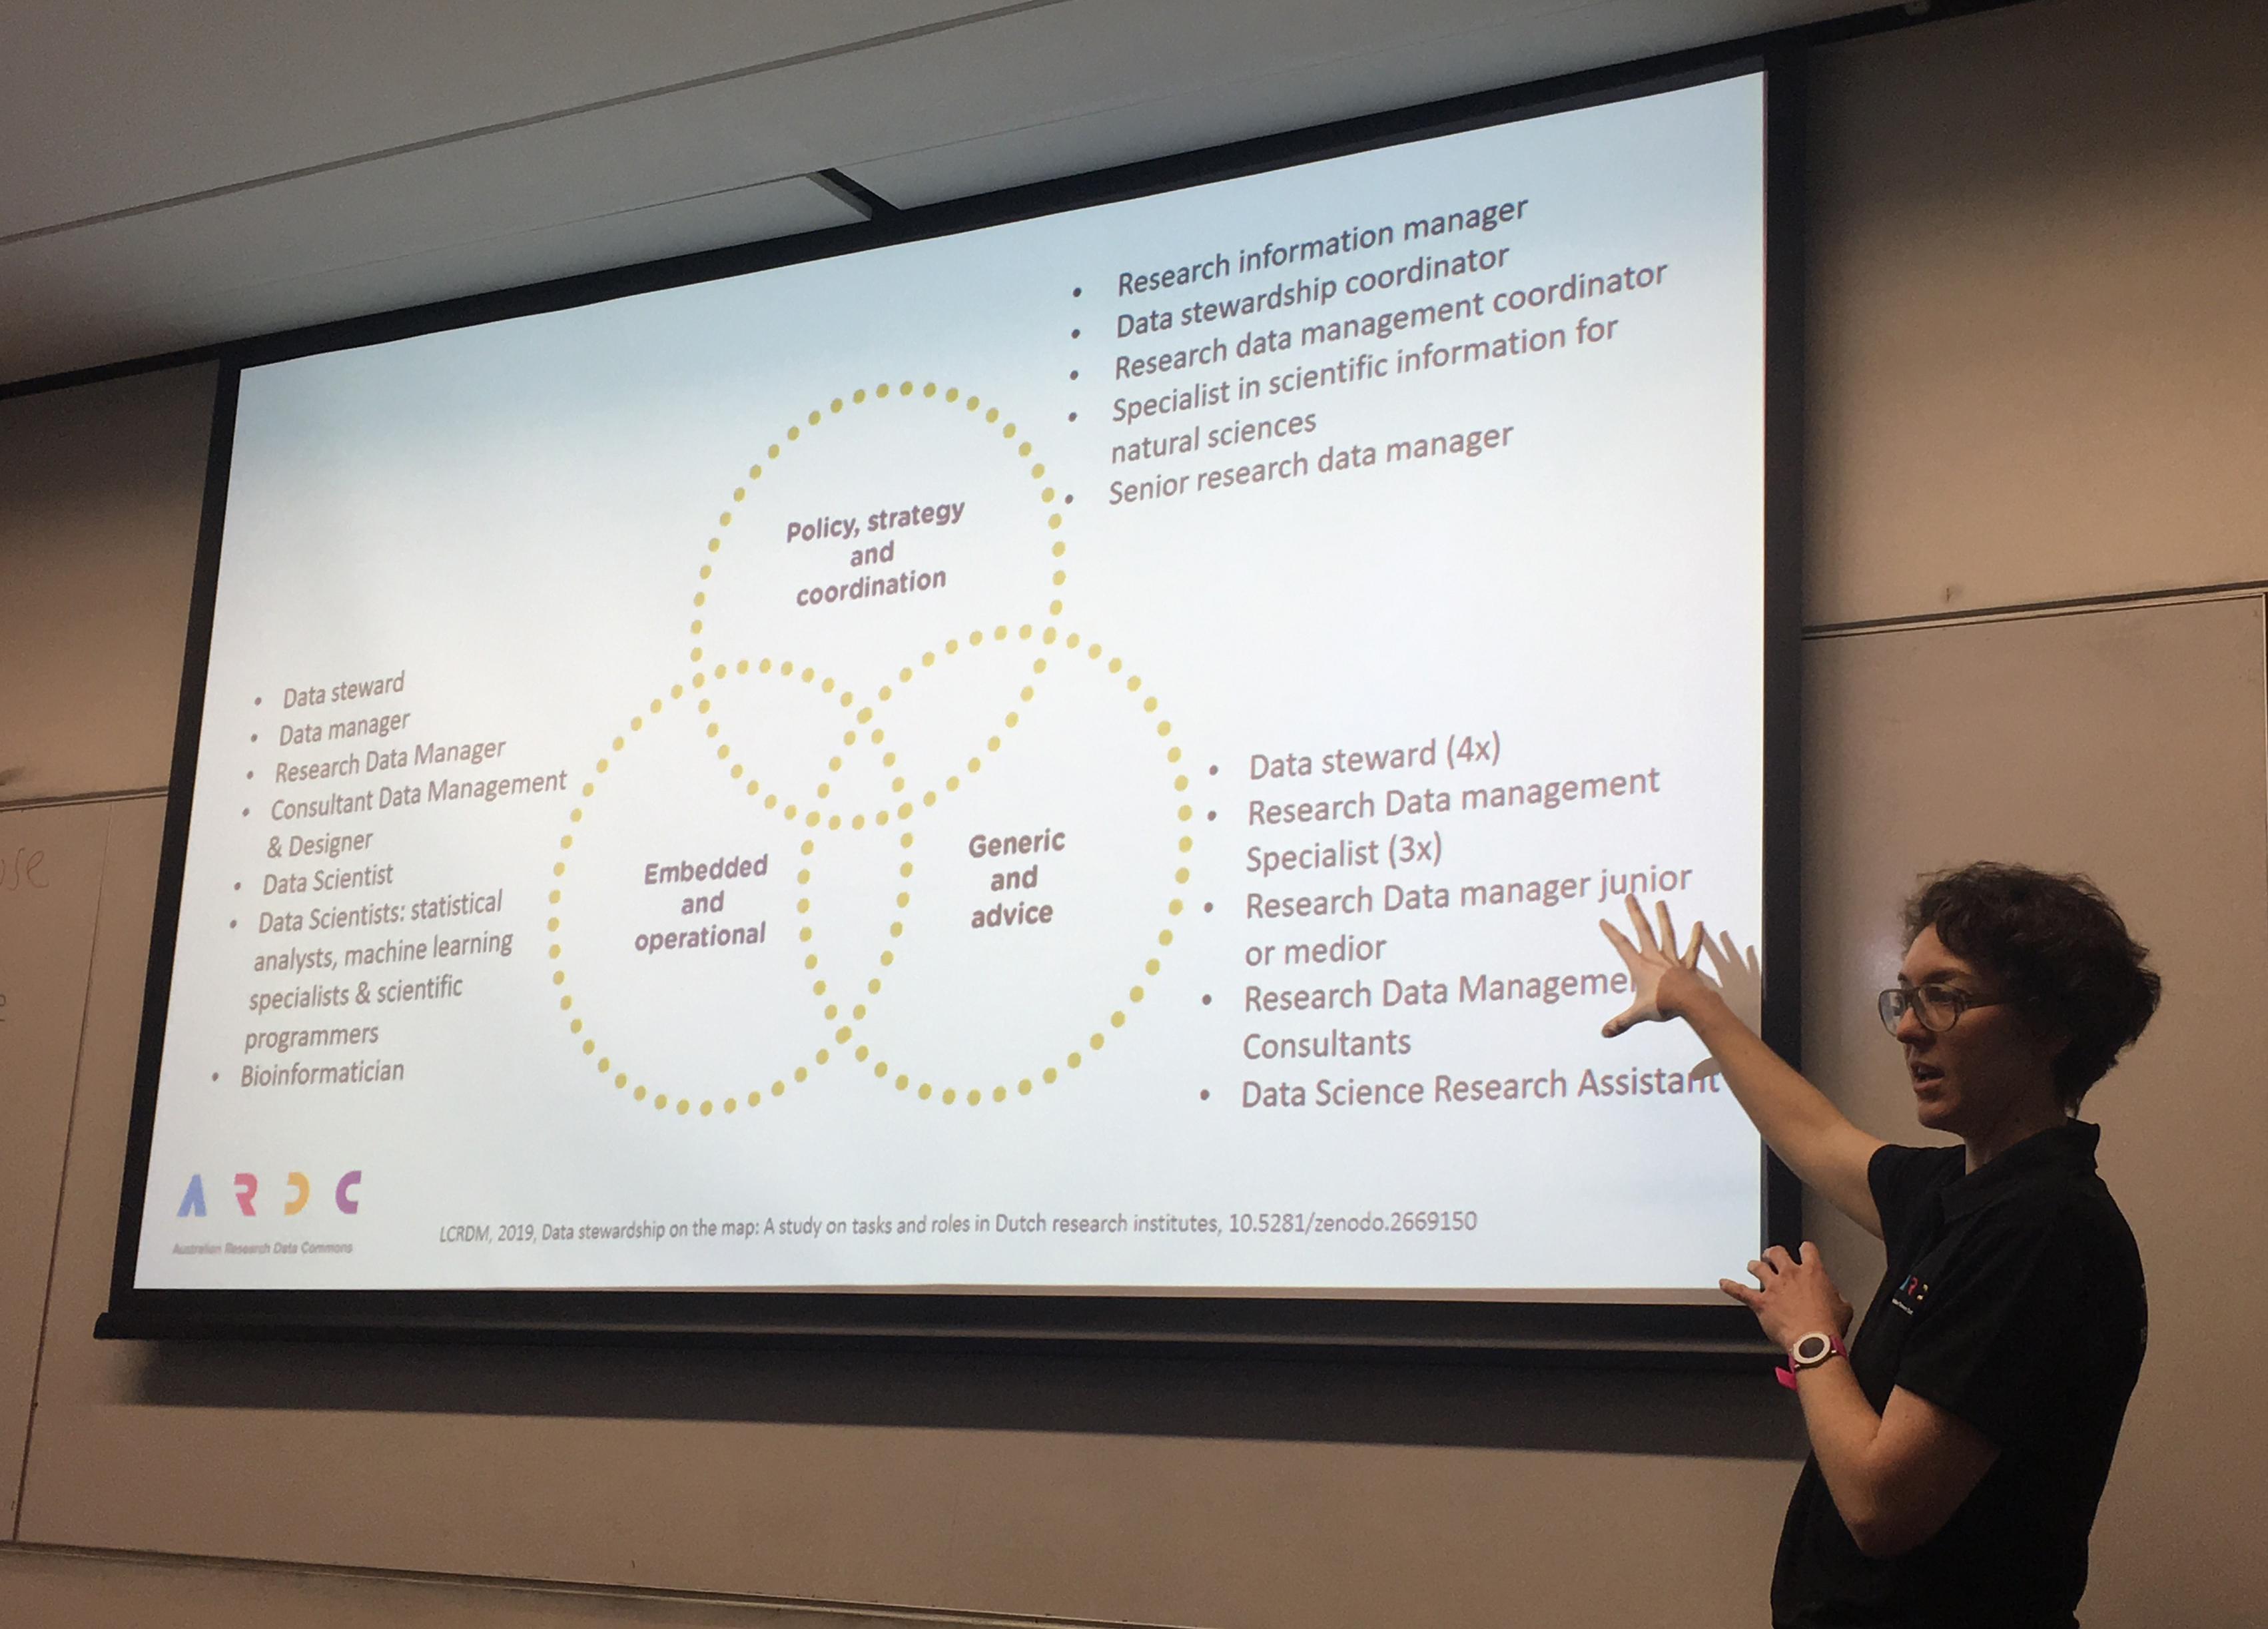 Australian eResearch Skilled Workforce Summit 2019